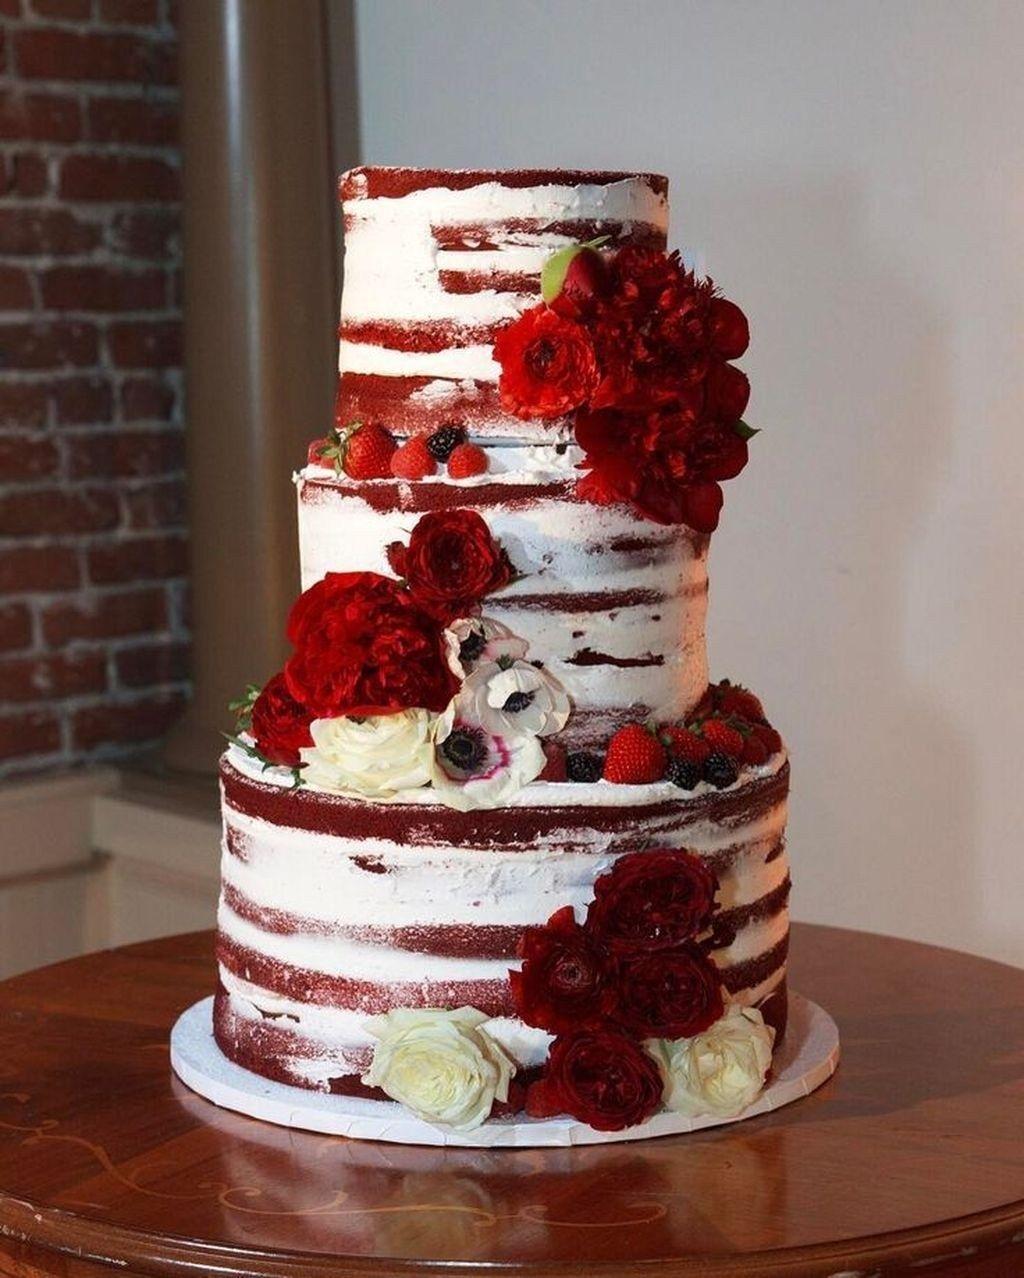 Pin On Birthday Holiday Any Day Cakes